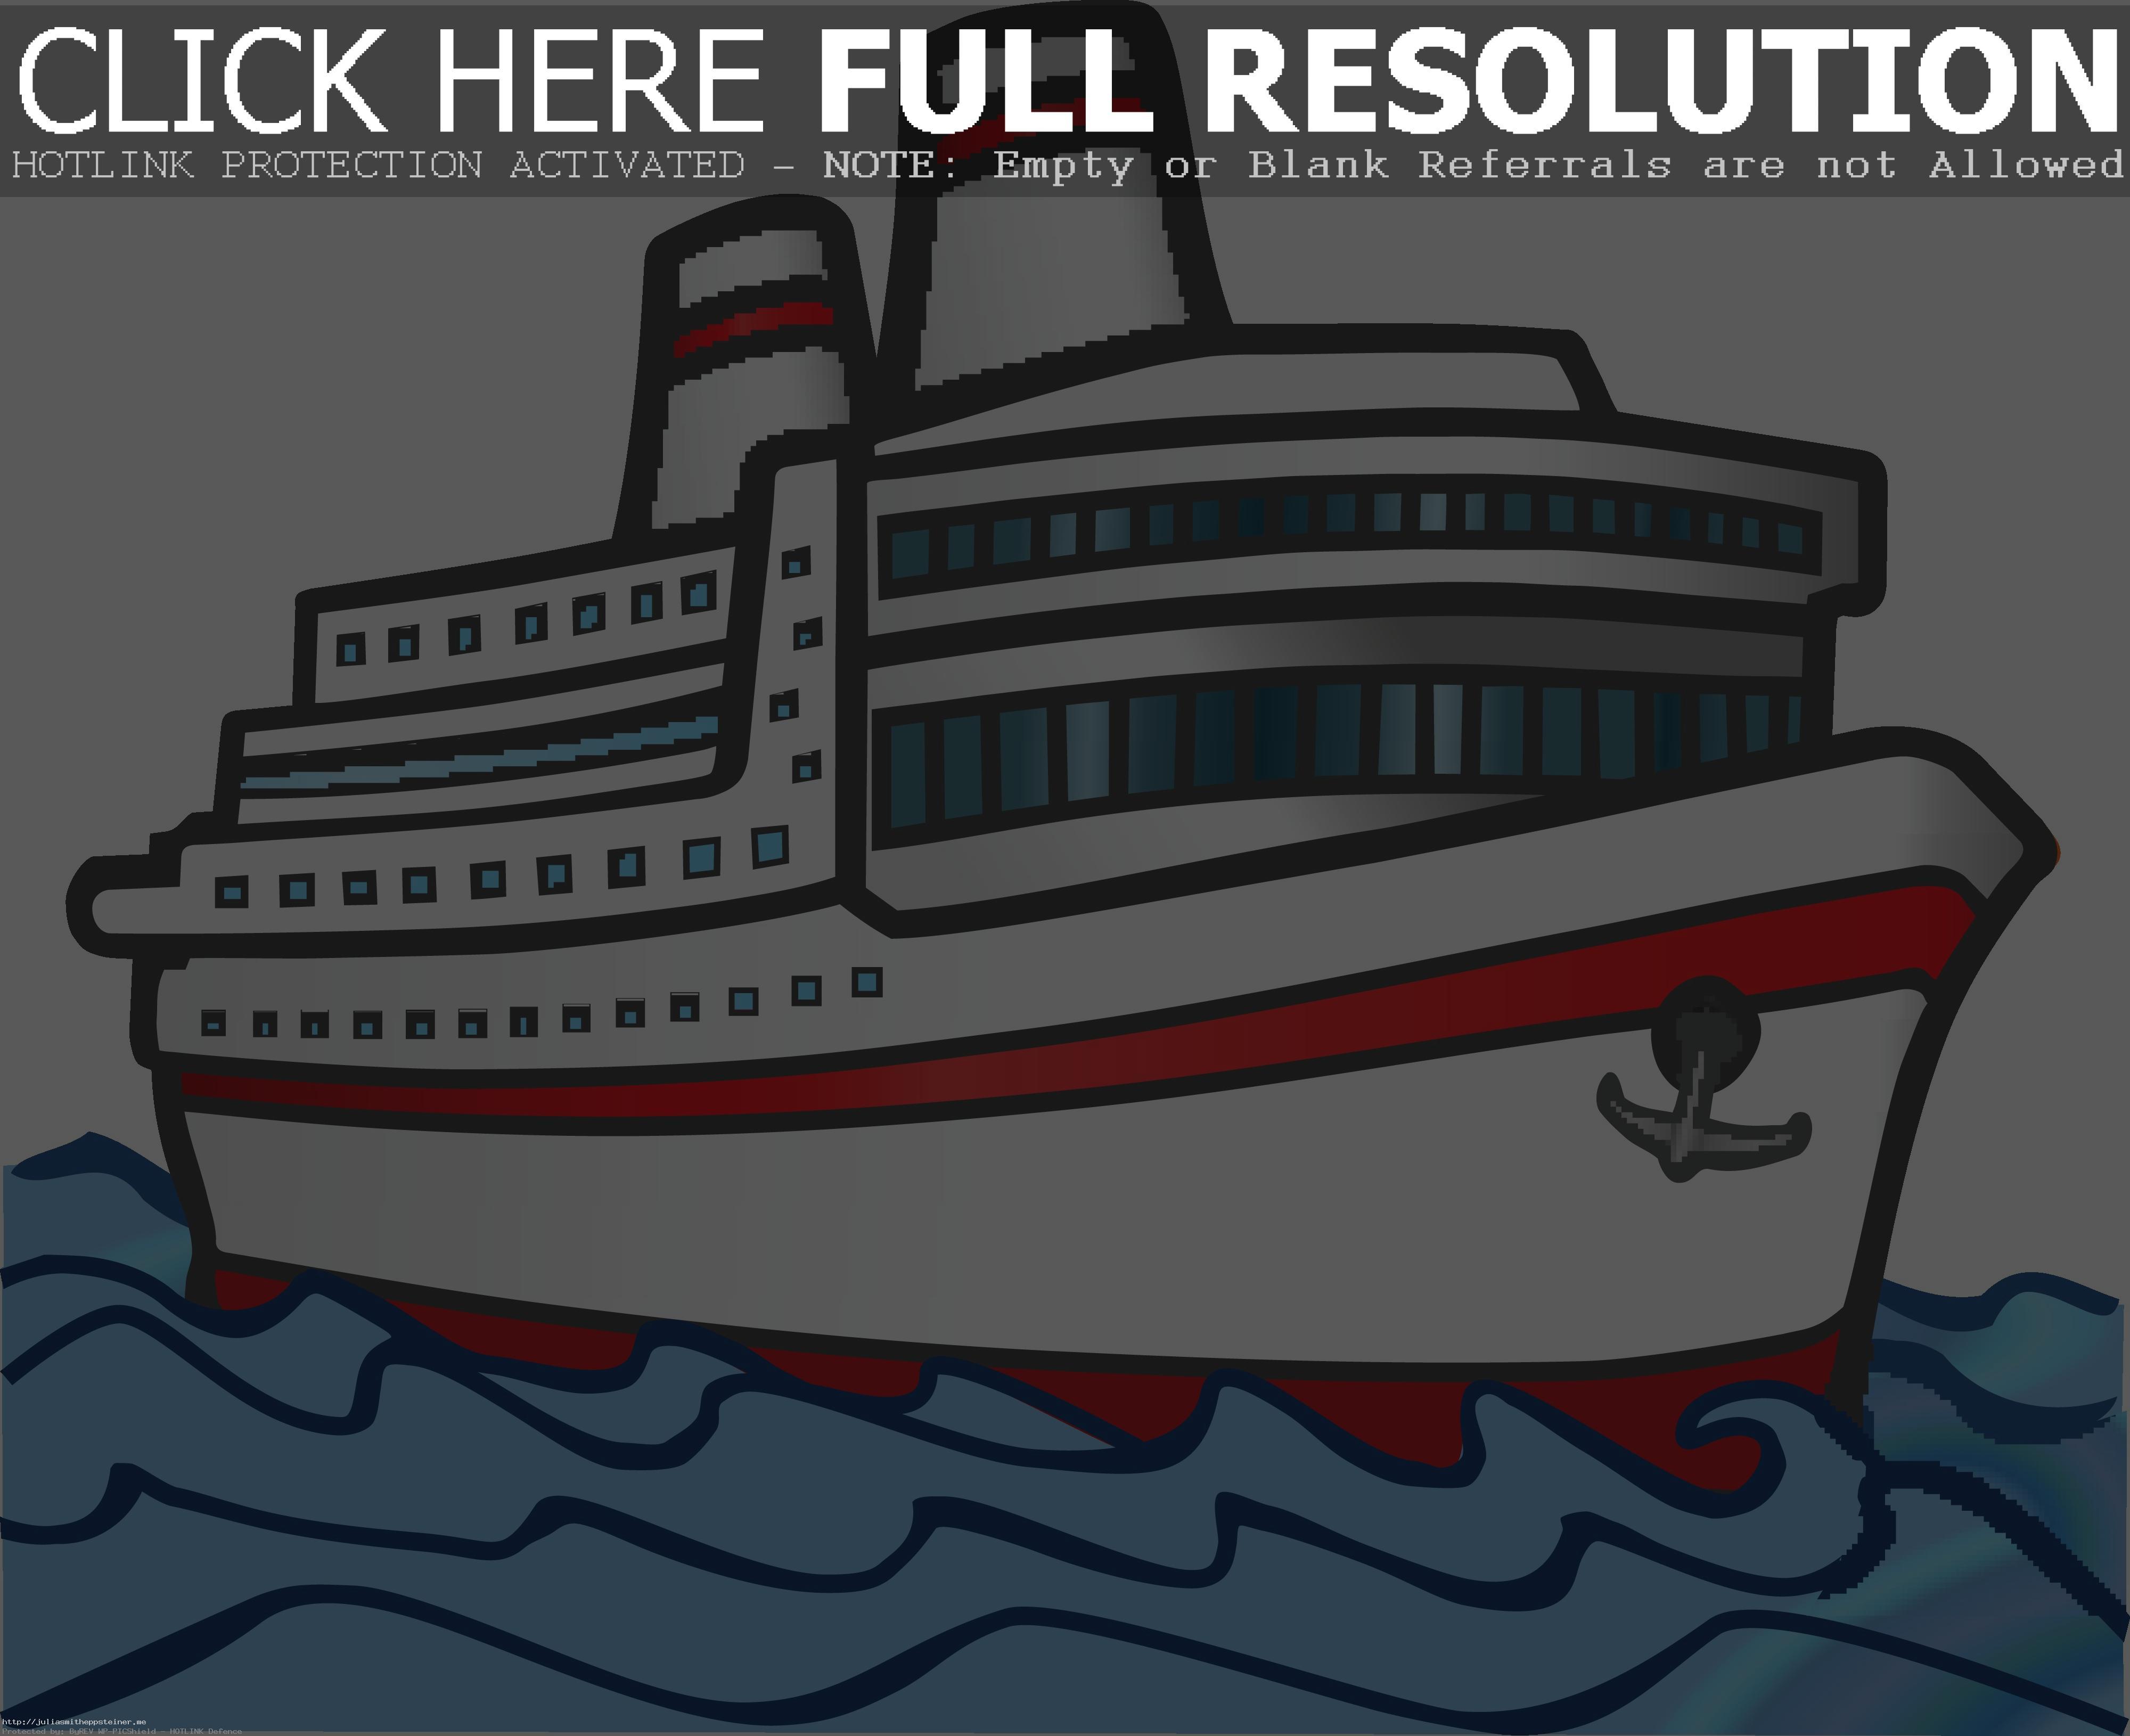 Free Clipart Of A Cruise Boat Fair Clipa-Free Clipart Of A Cruise Boat Fair ClipartLook.com -12